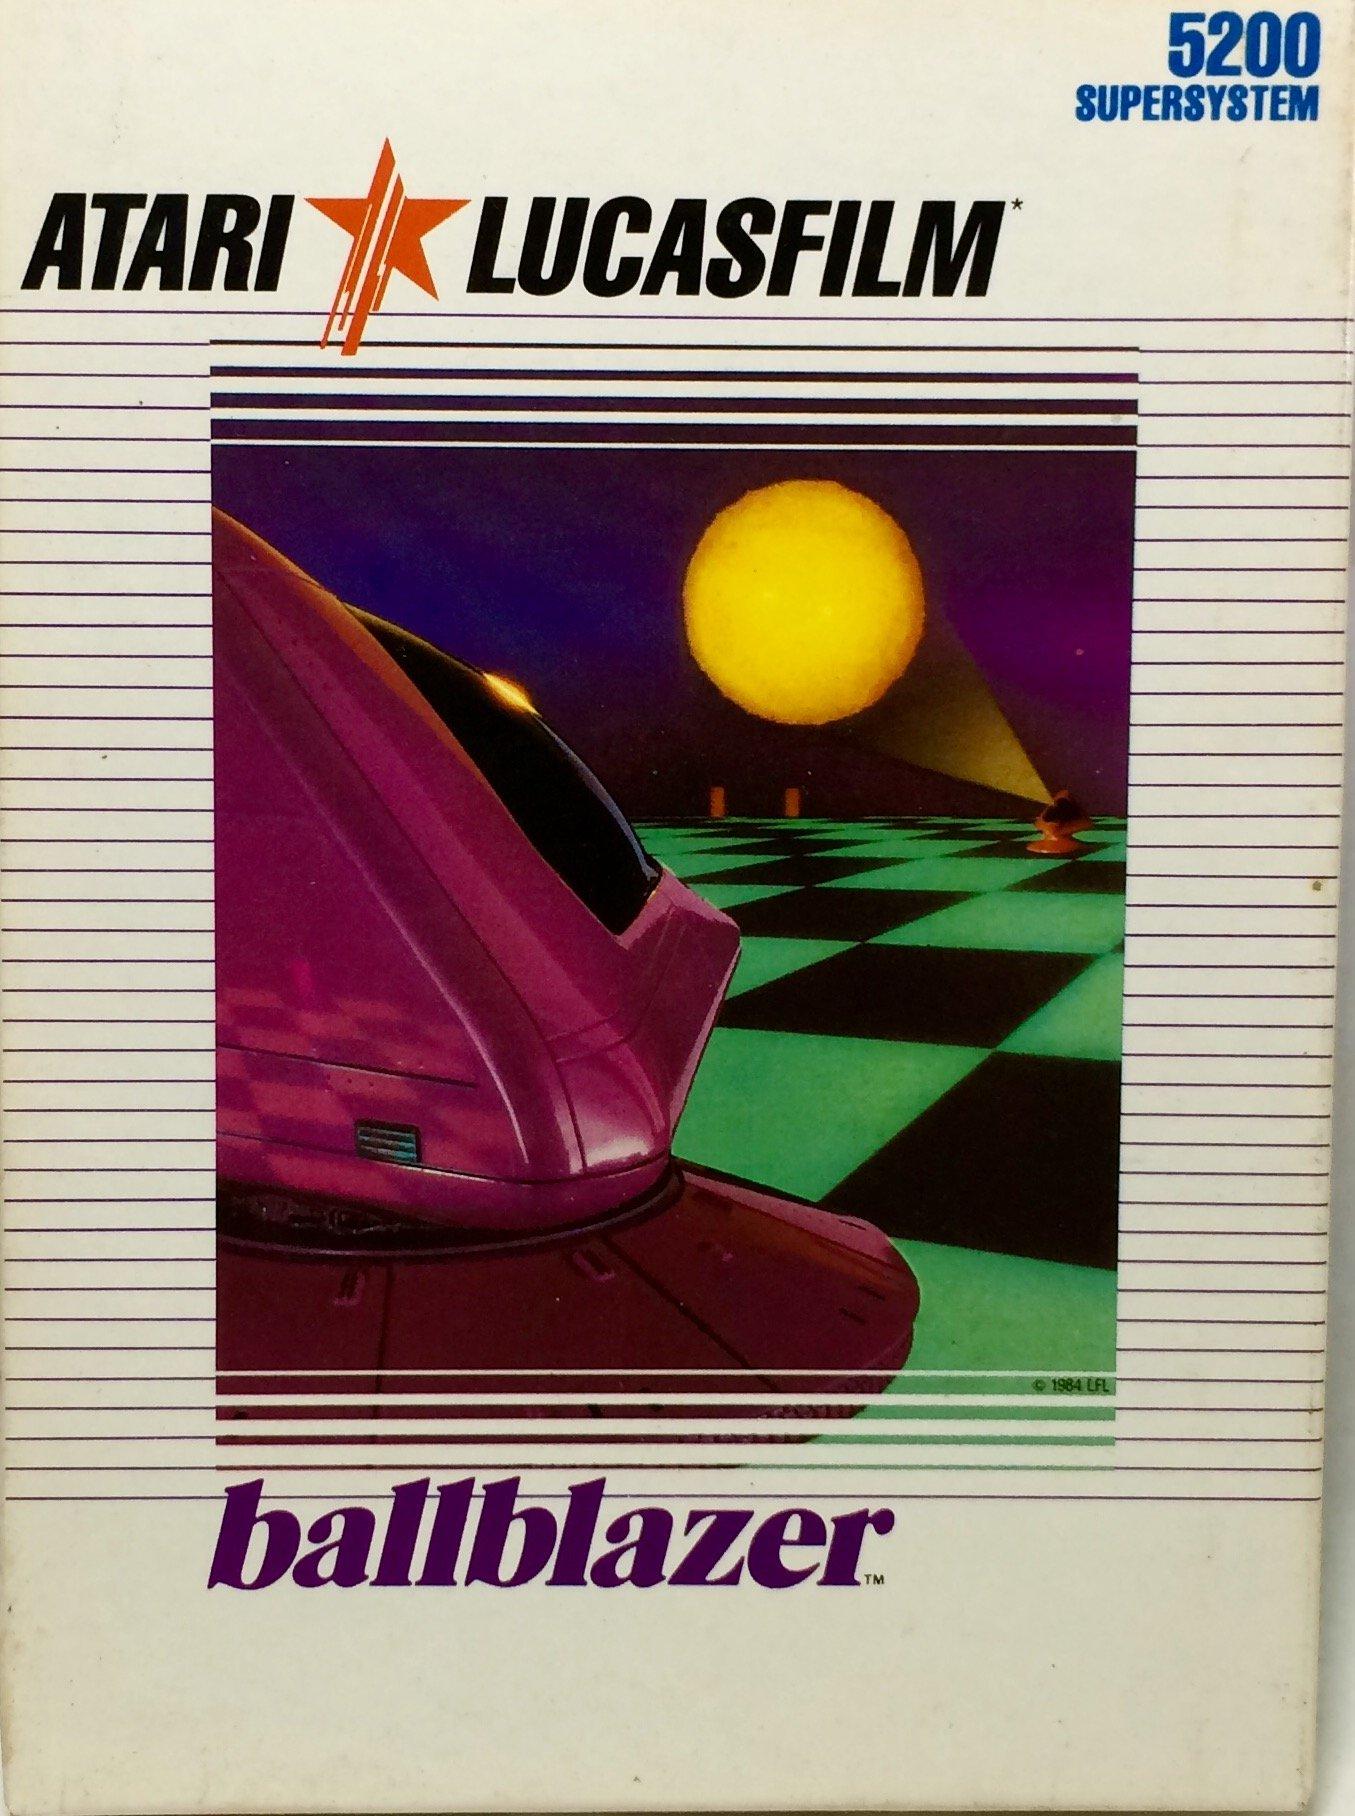 Ballblazer - Lucasfilm - NTSC - Atari 5200 Supersystem by Lucasfilm (Image #1)